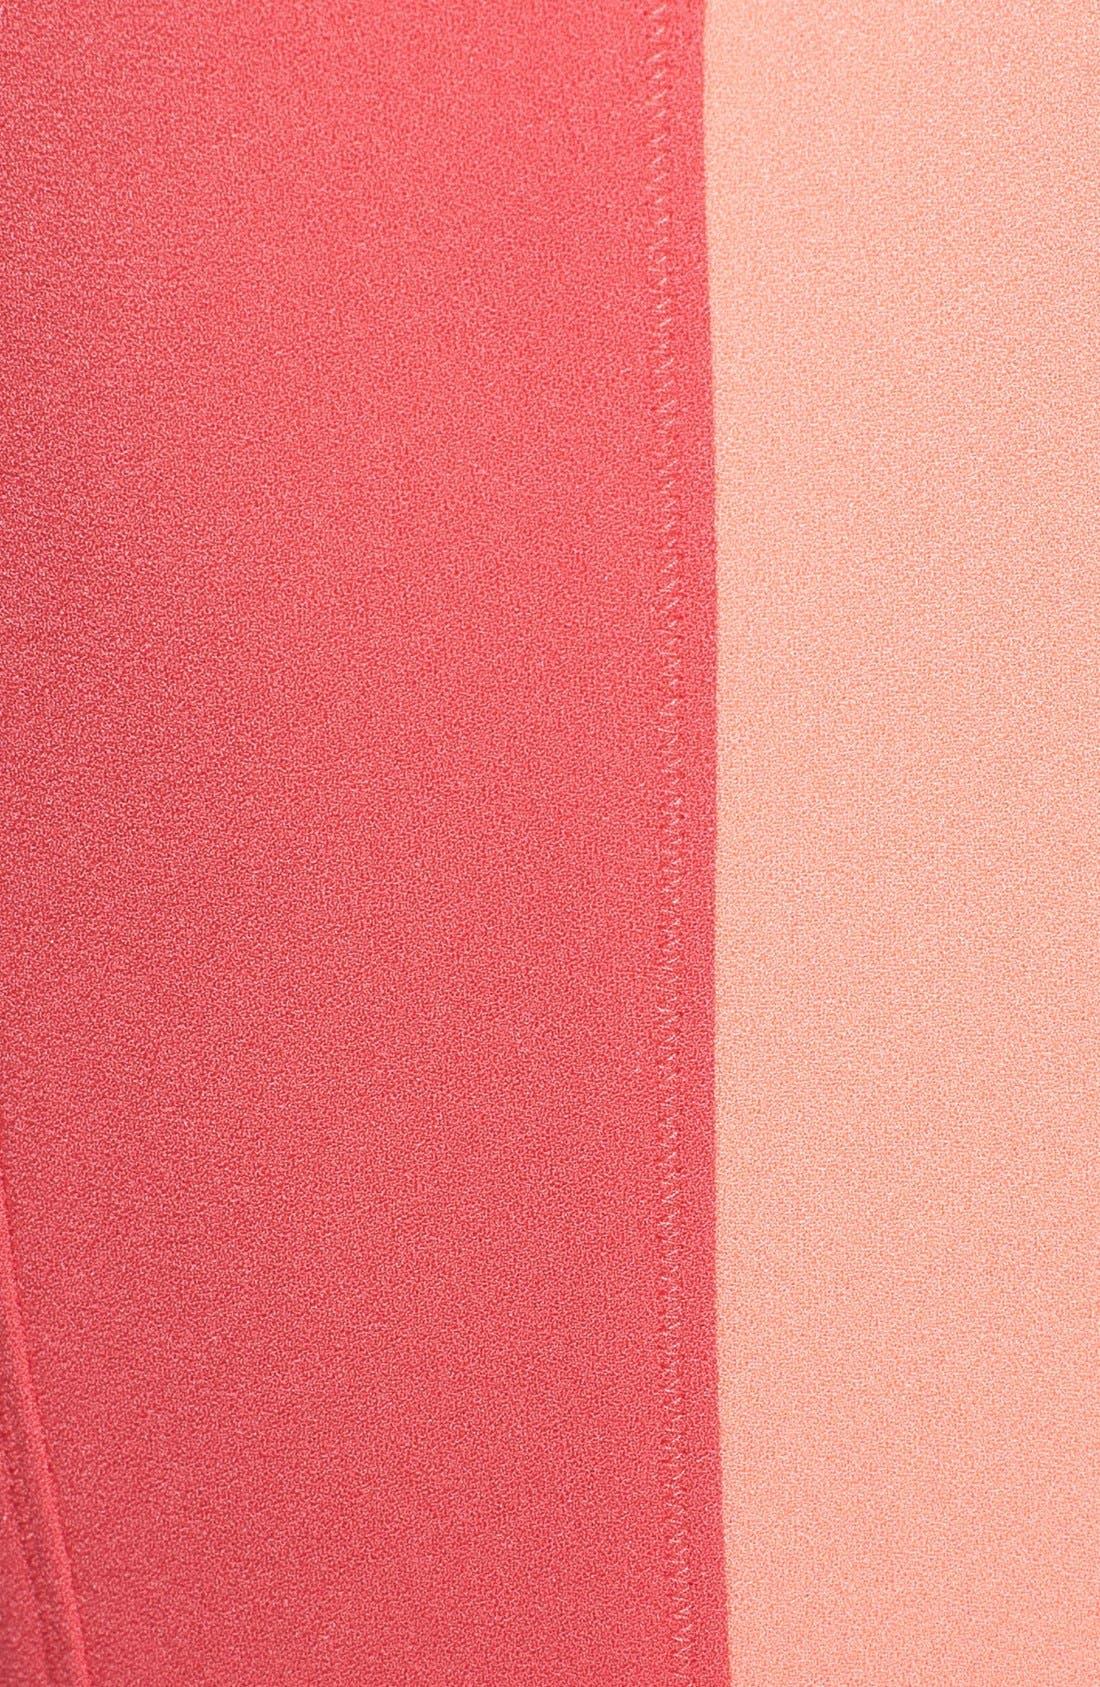 Alternate Image 3  - Elie Tahari 'Rosario' Colorblock Crepe Fit & Flare Dress